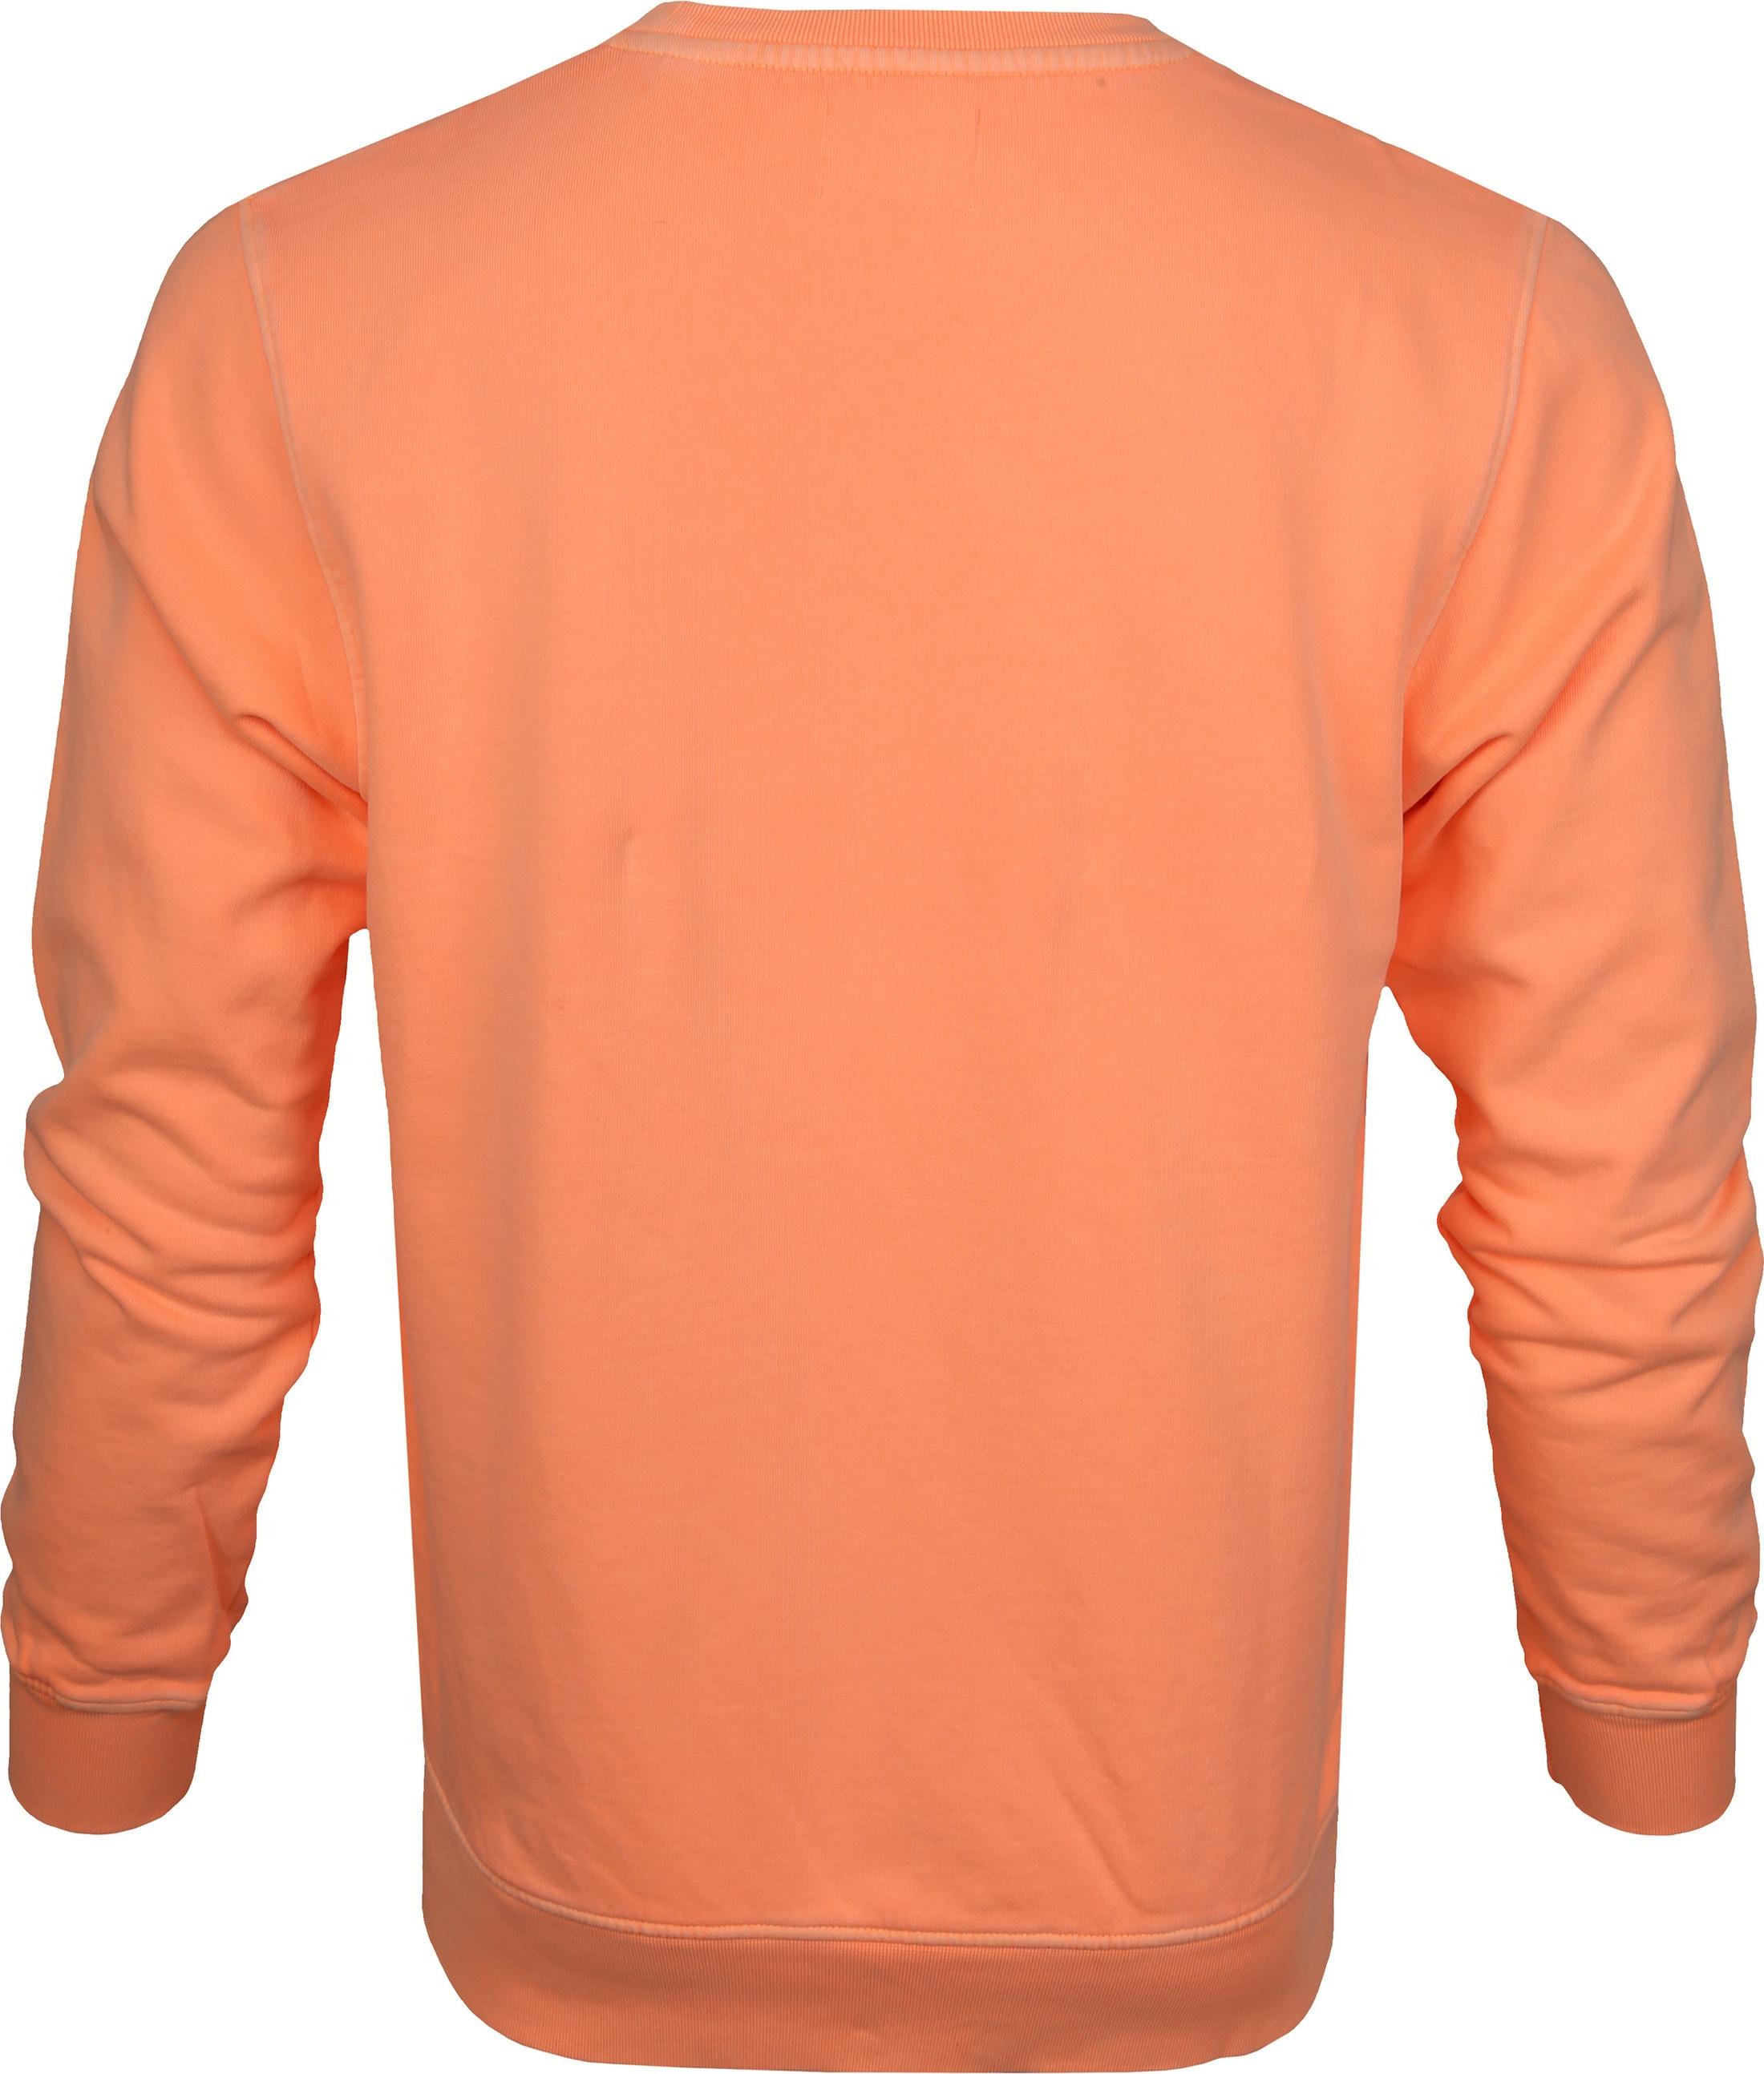 Colorful Standard Sweater Neon Oranje foto 3